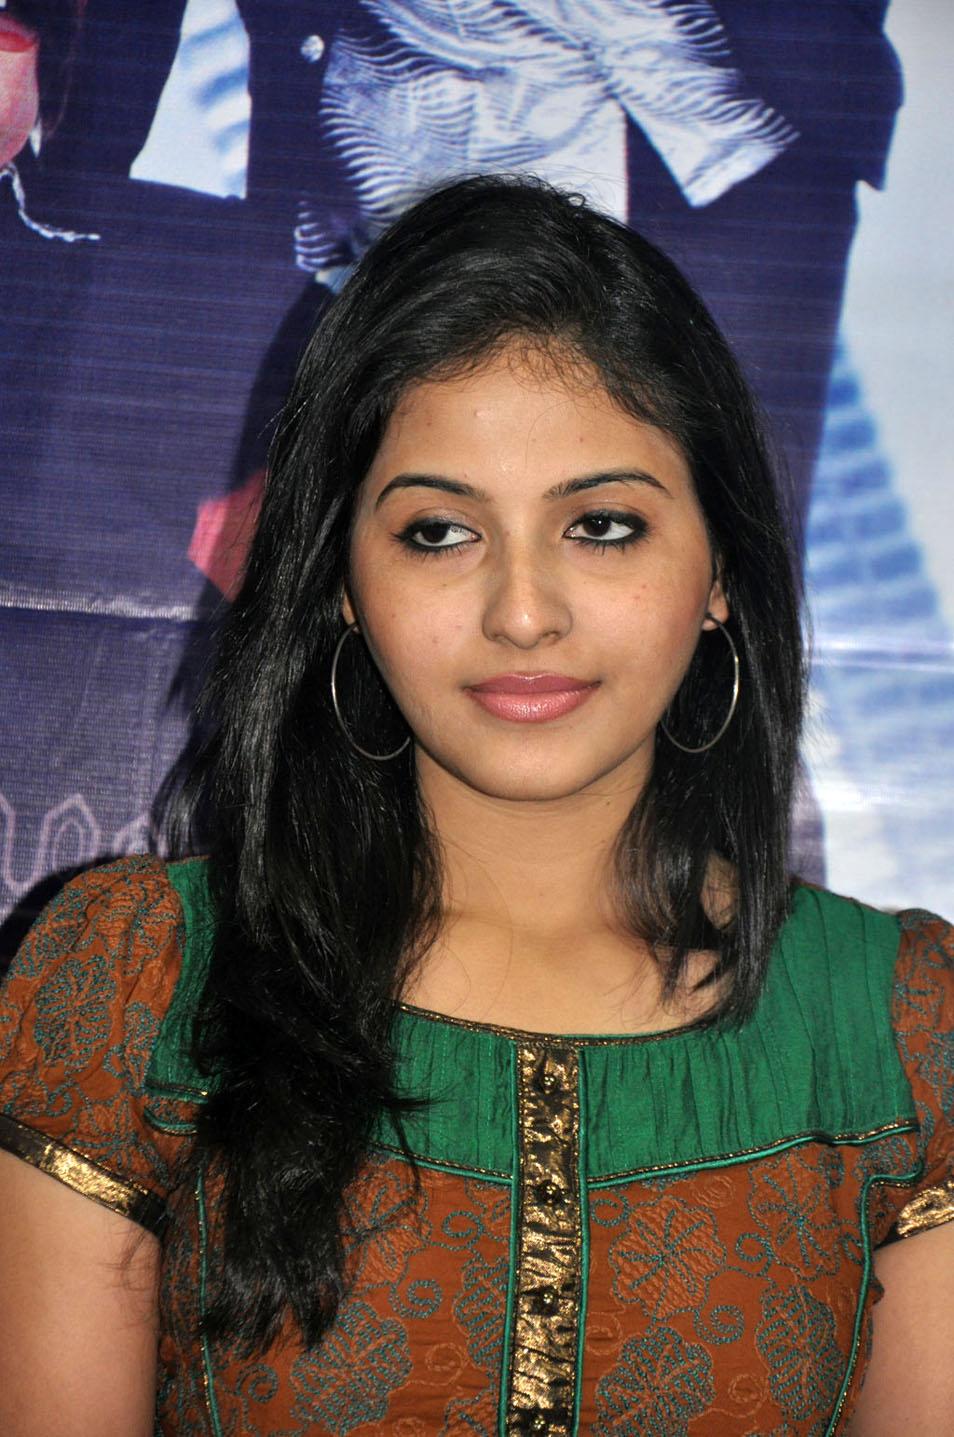 Aditi sharma 2 free indian porn video 06 xhamster - 5 3